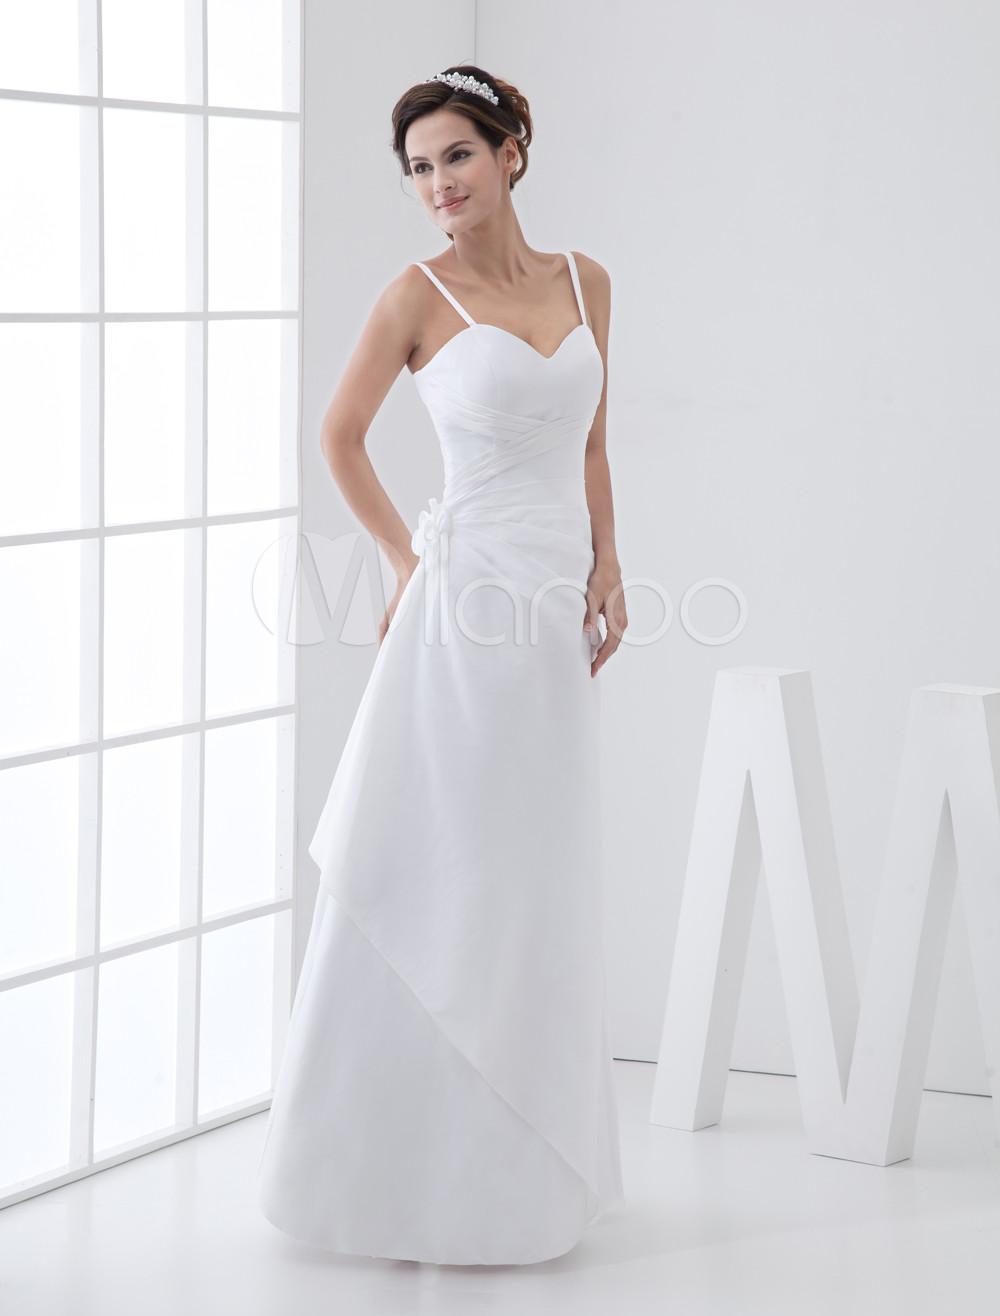 White Ruched A-Line Straps Taffeta Wedding Gown (Cheap Wedding Dress) photo